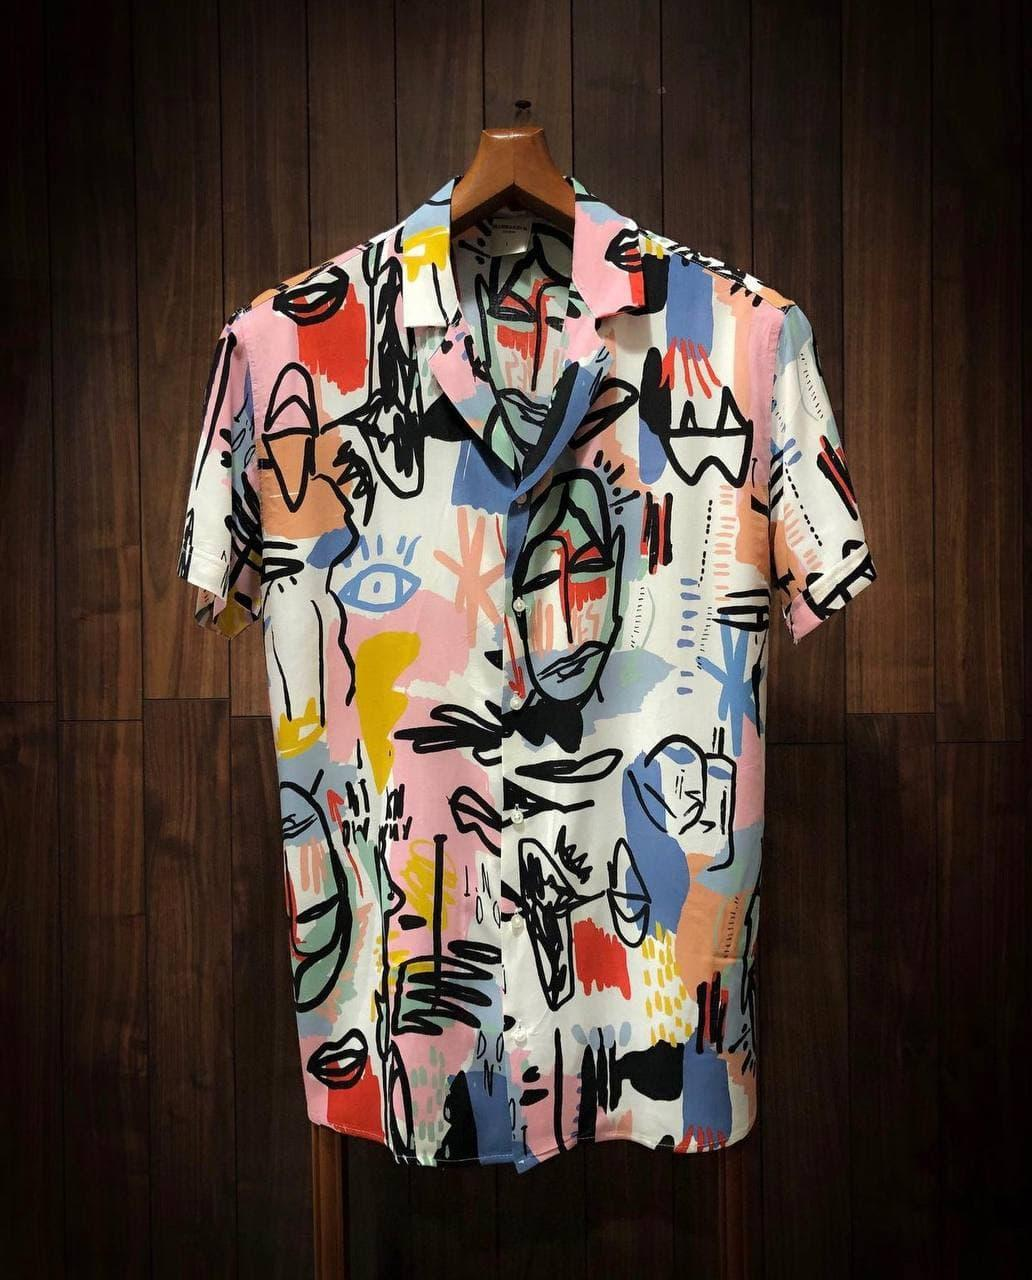 Мужская легенькая рубашка цветная